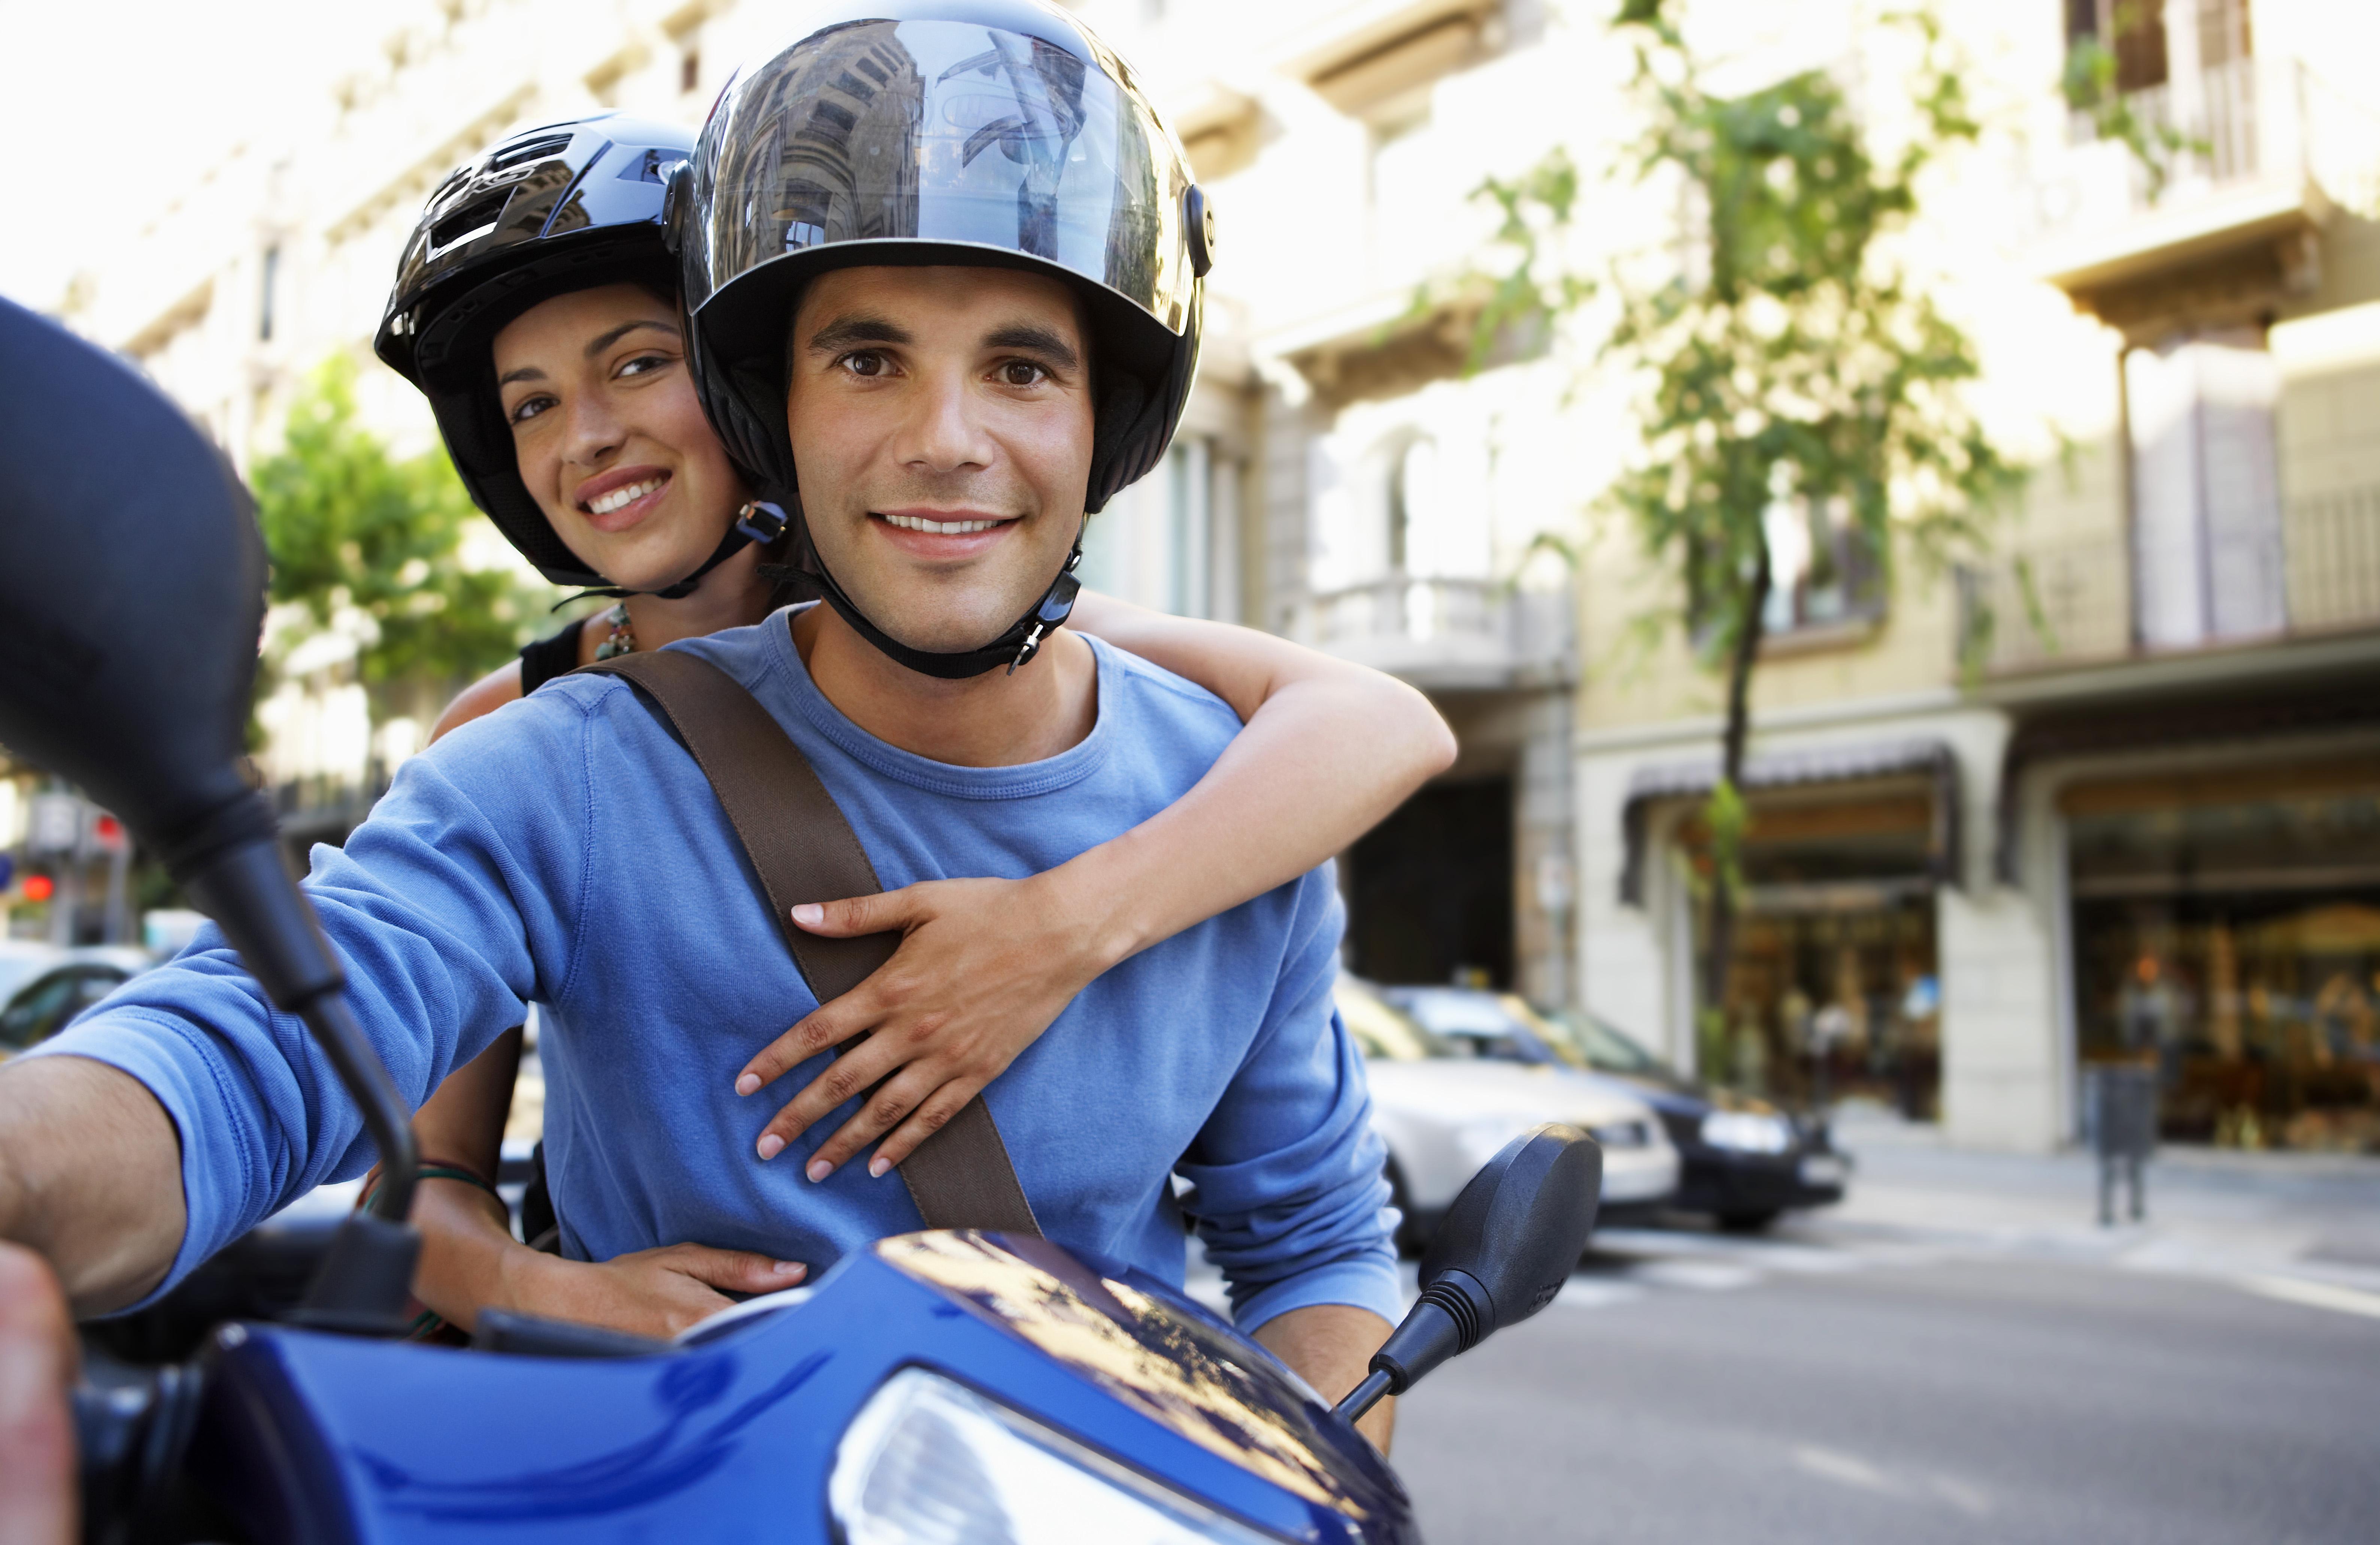 persoane calatorind pe motocicleta